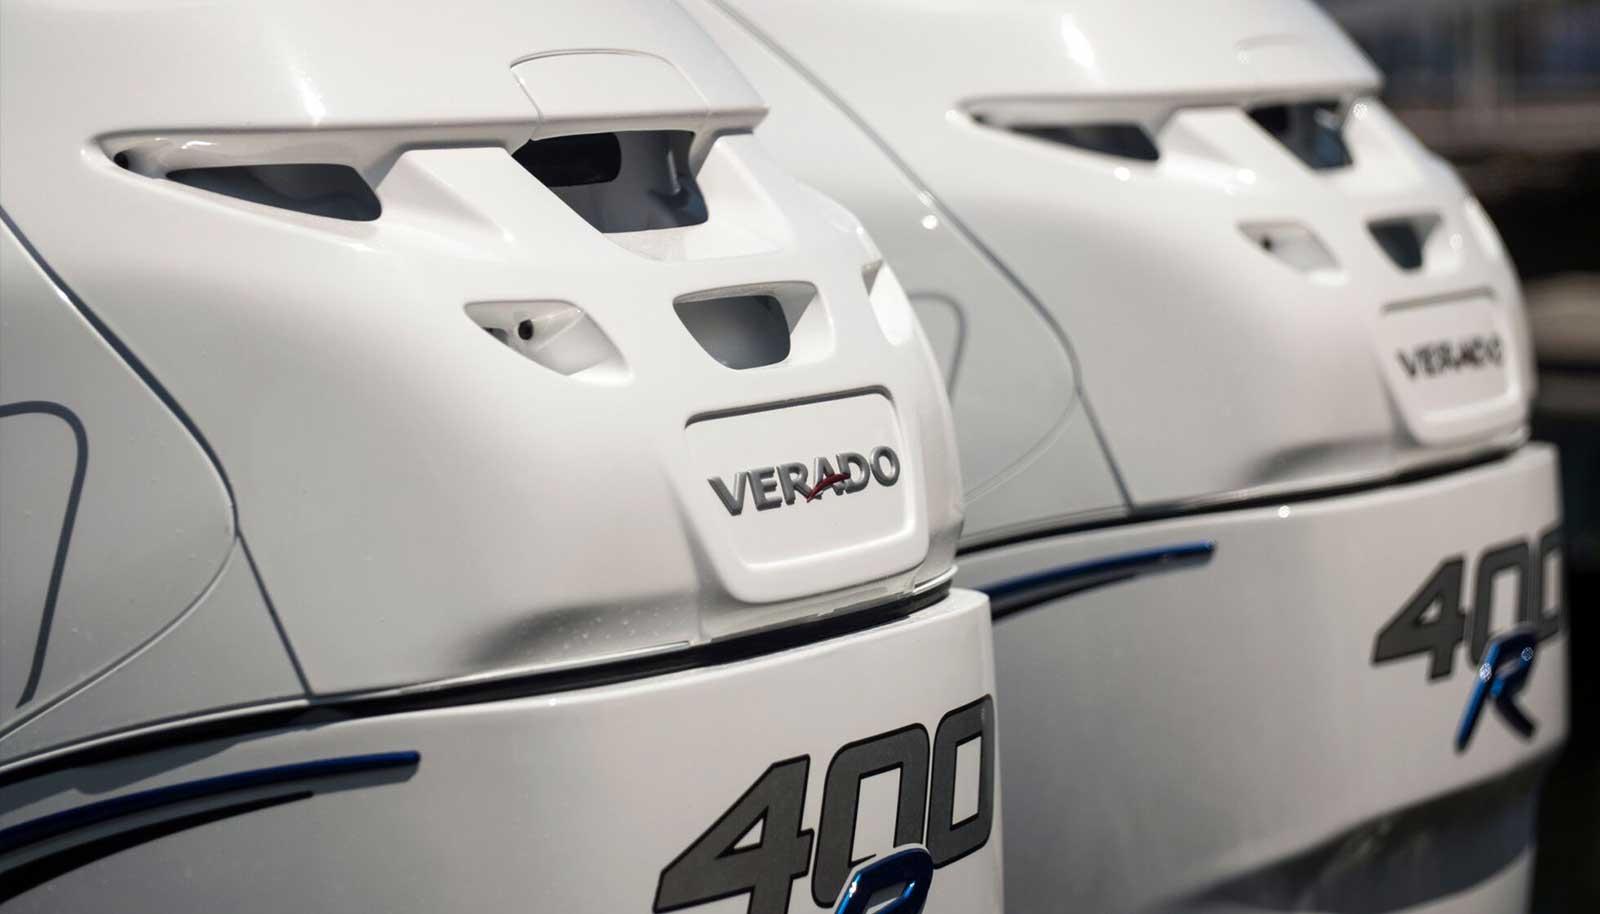 yacht-engines-2.jpg